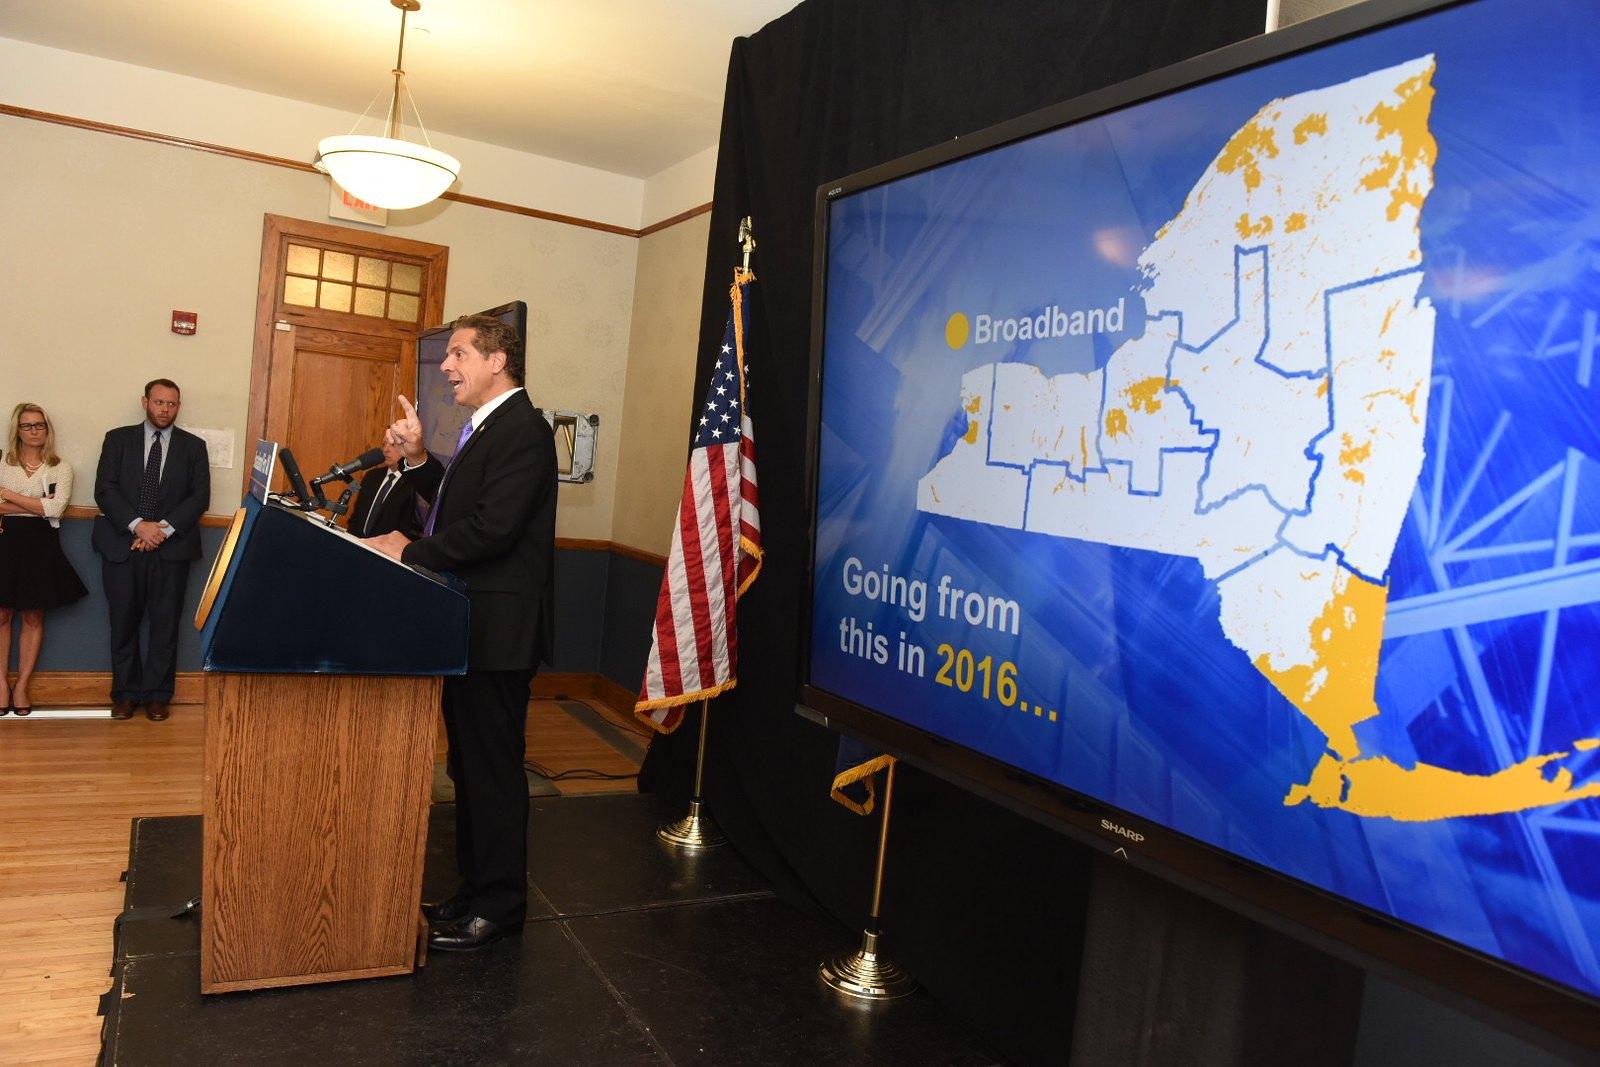 Governor Cuomo Announces Broadband Improvements in Hudson